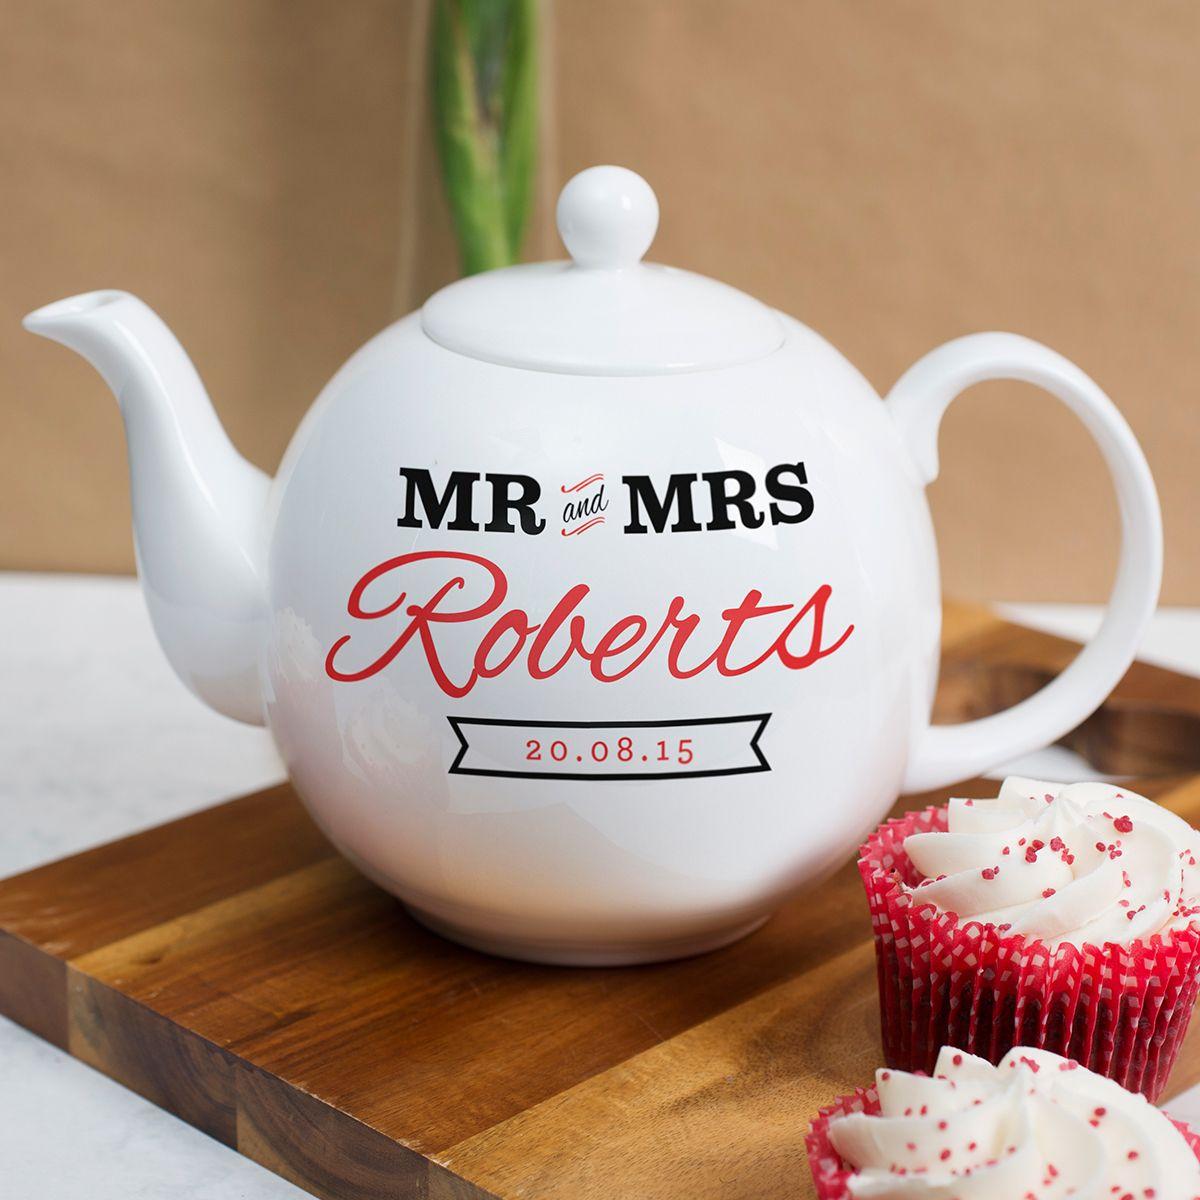 Personalised Wedding Gifts GettingPersonal.co.uk